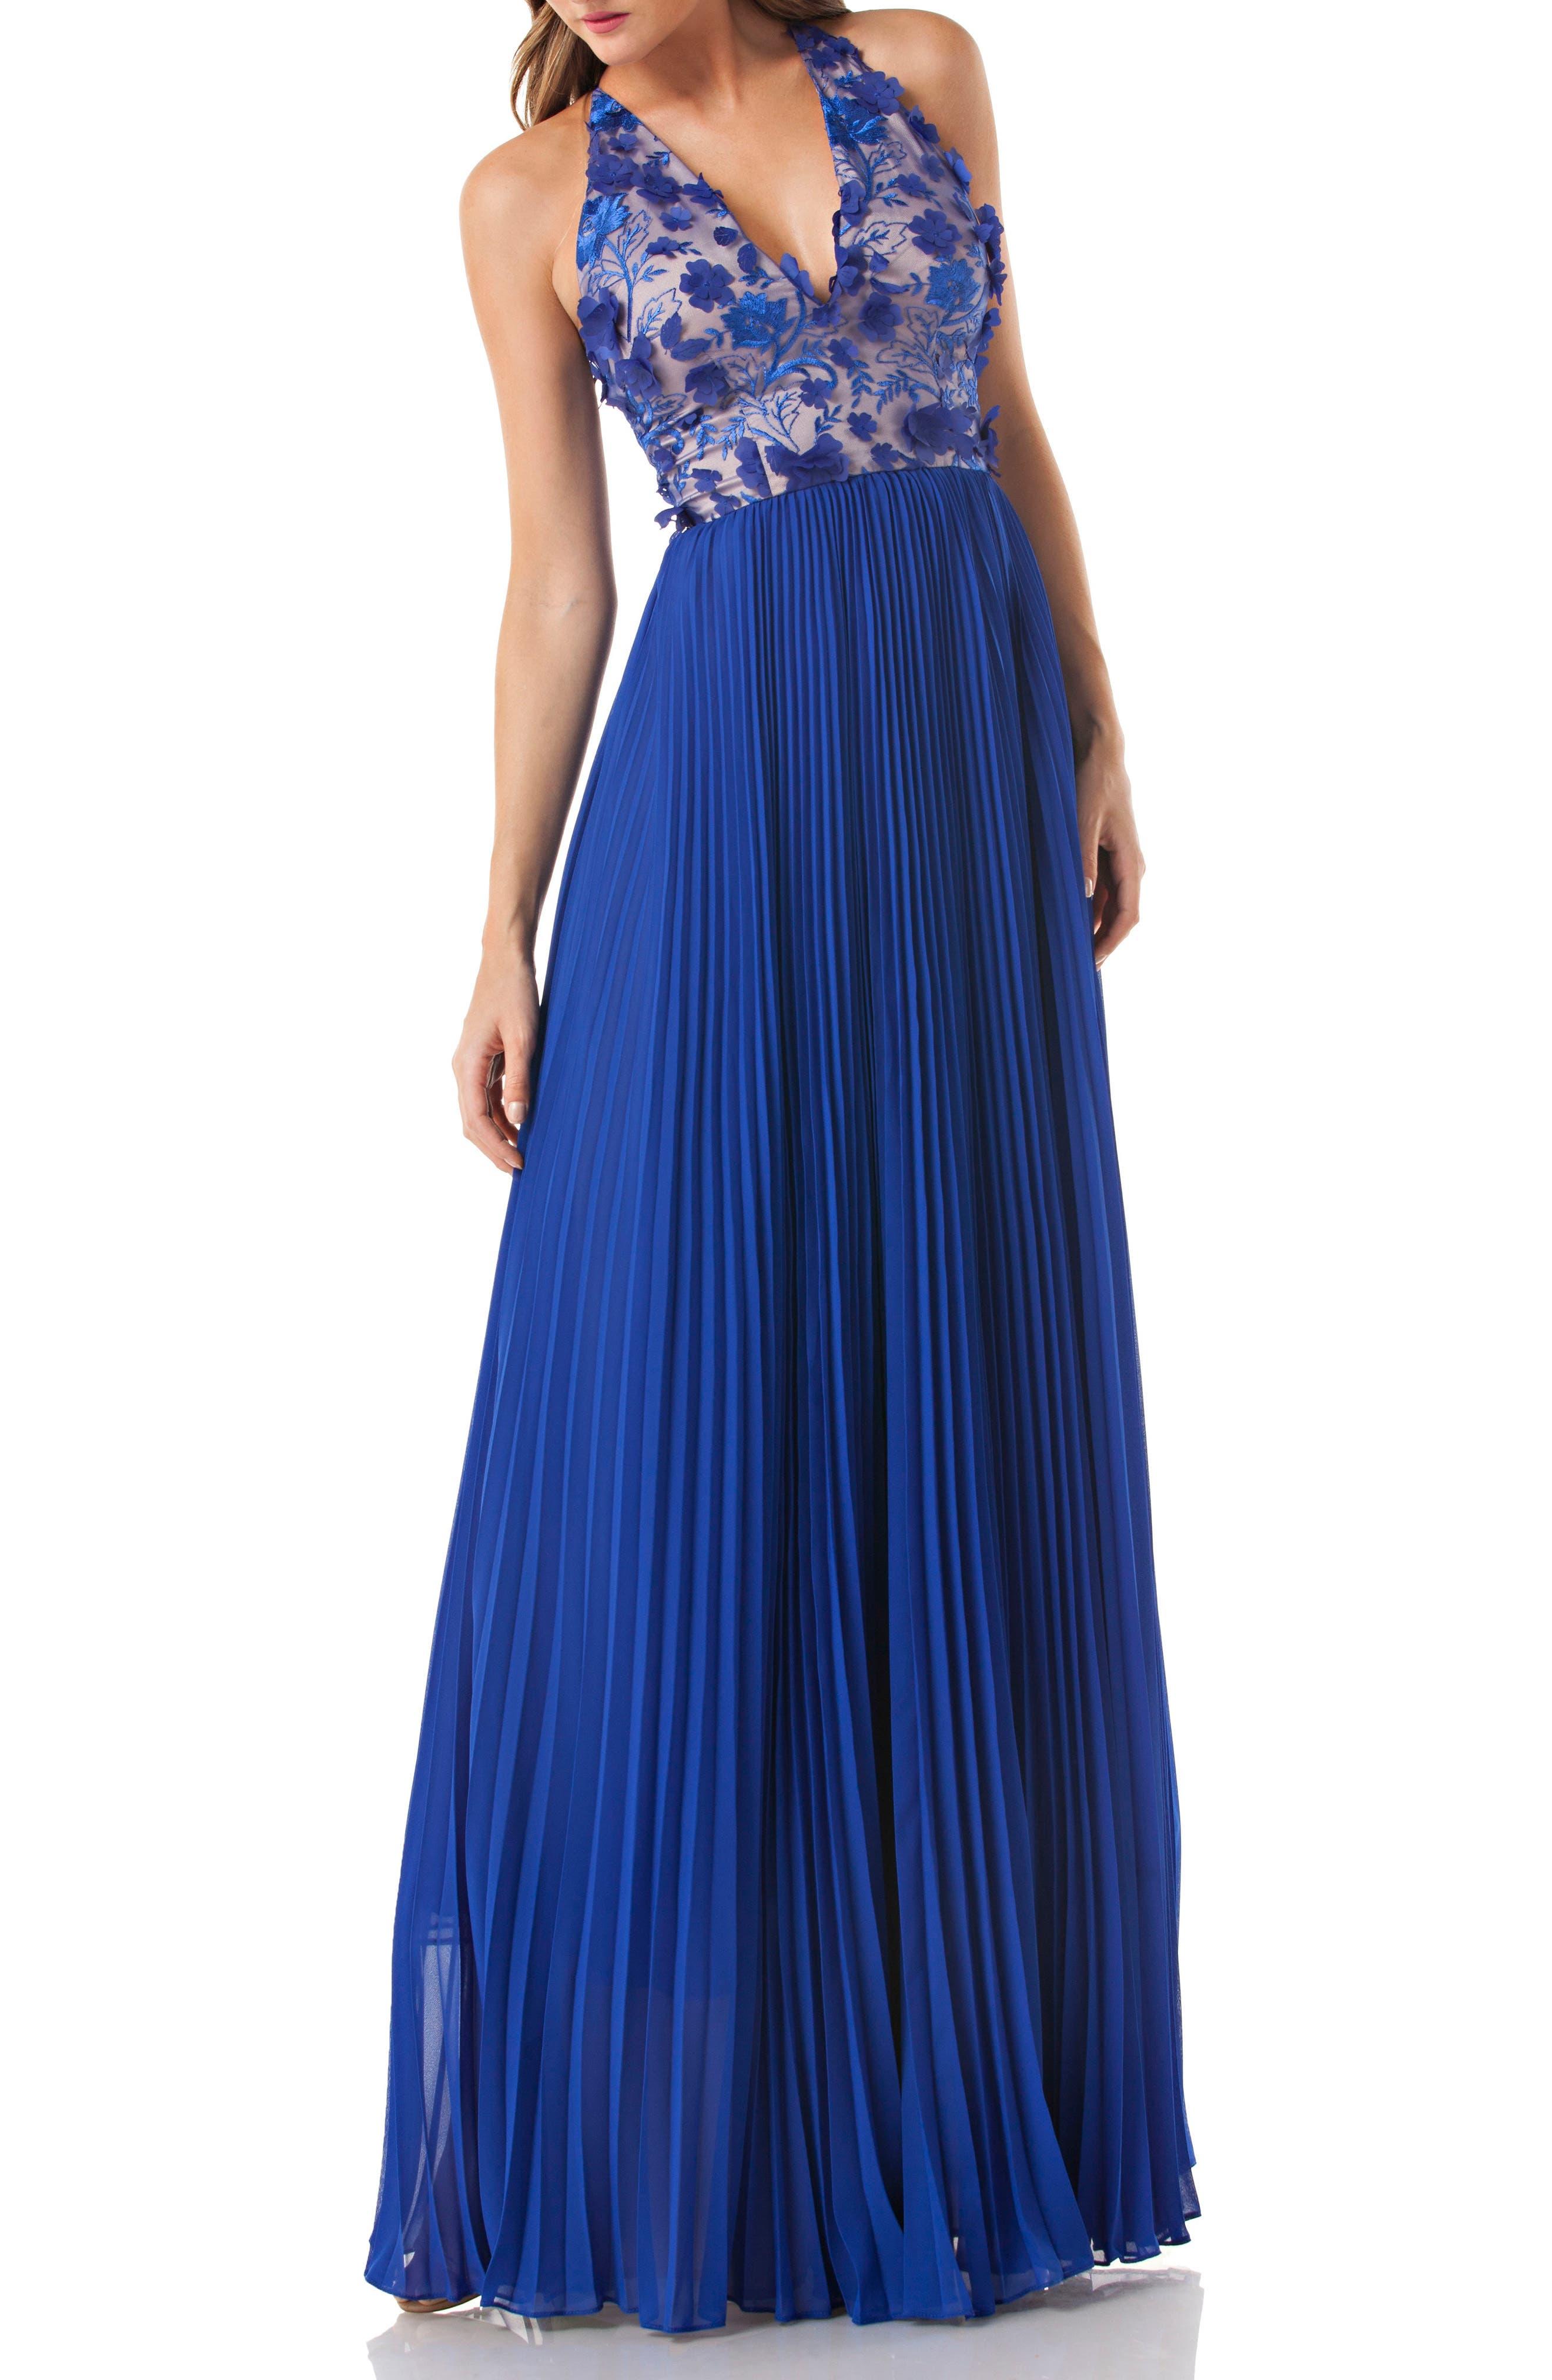 Petals Halter Gown,                             Main thumbnail 1, color,                             Cobalt